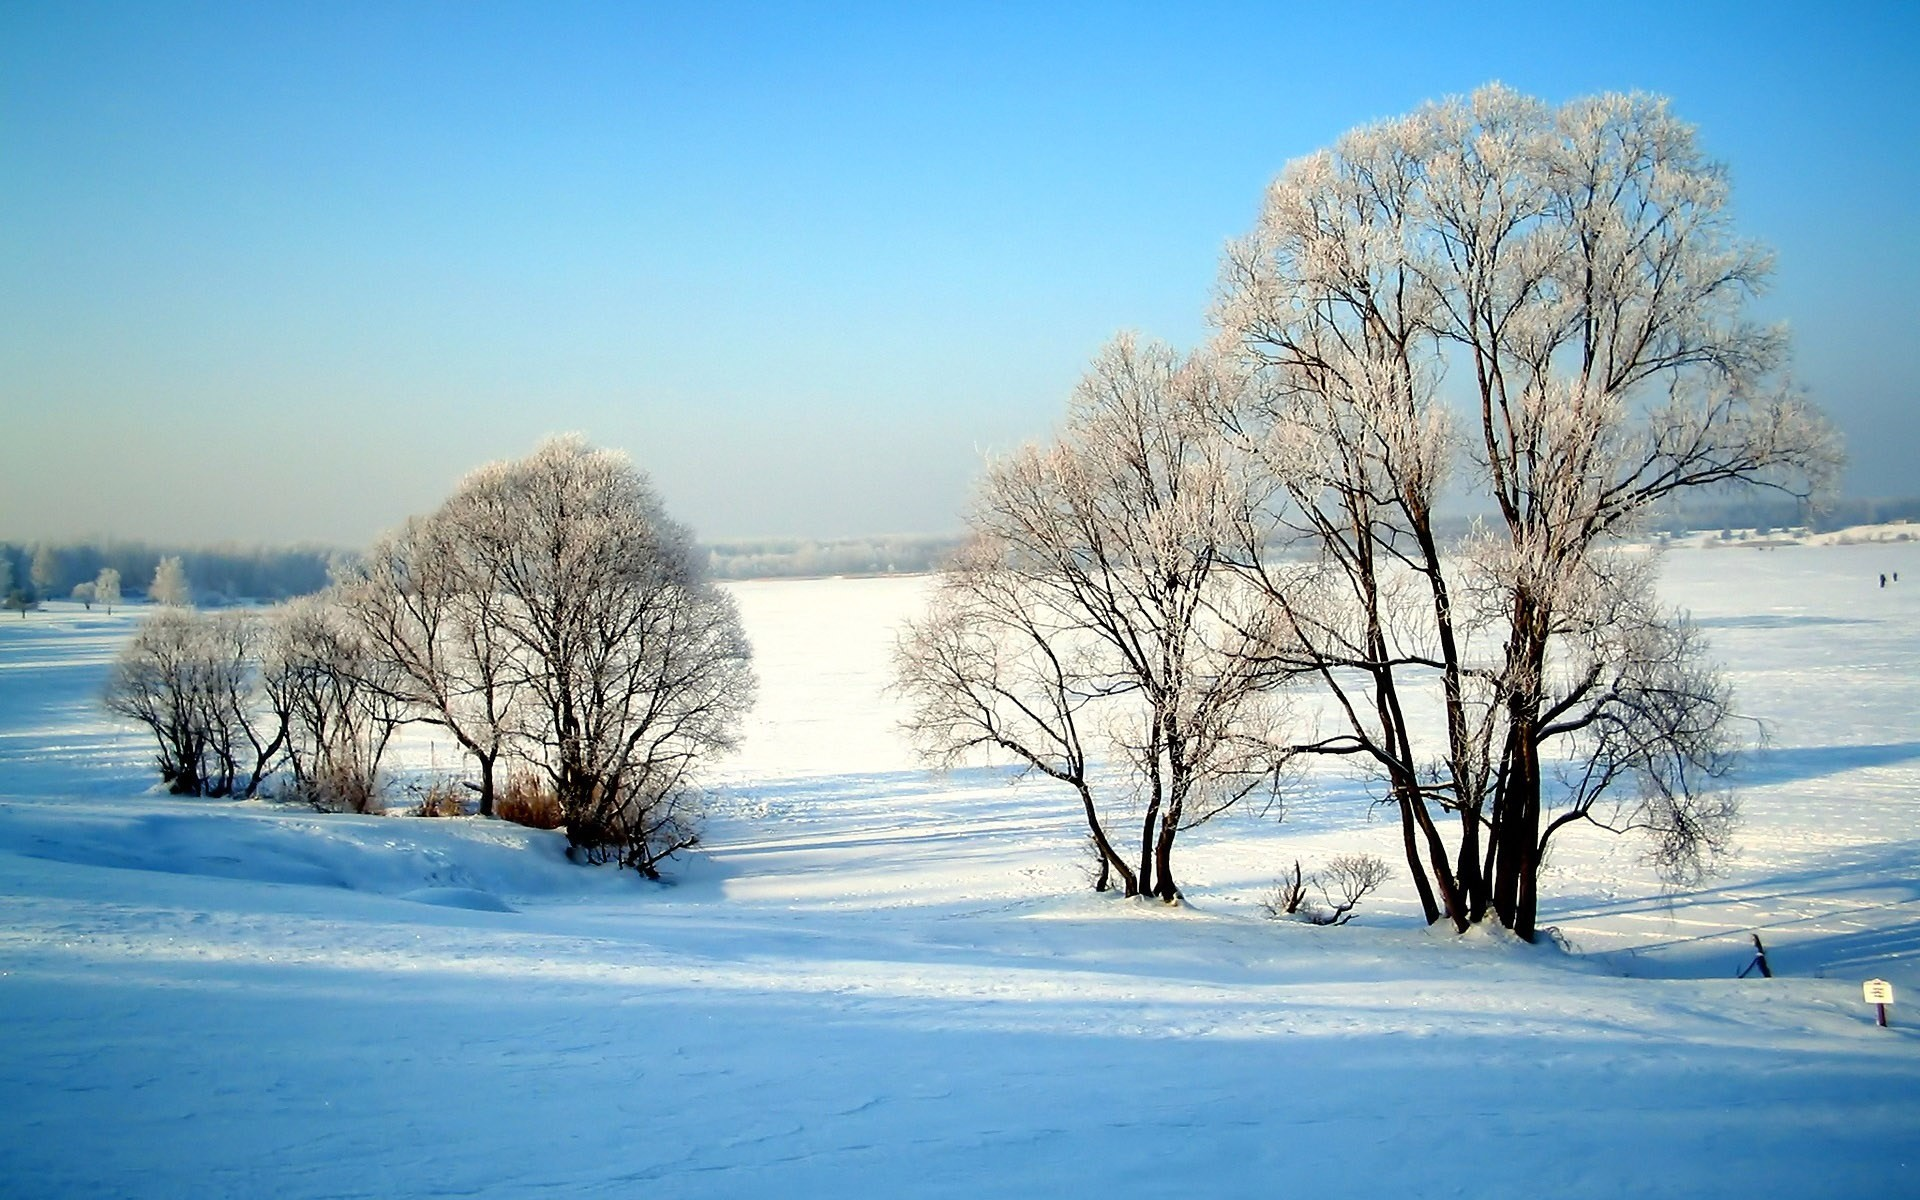 Winter Solstice HD Wallpapers – THIS Wallpaper